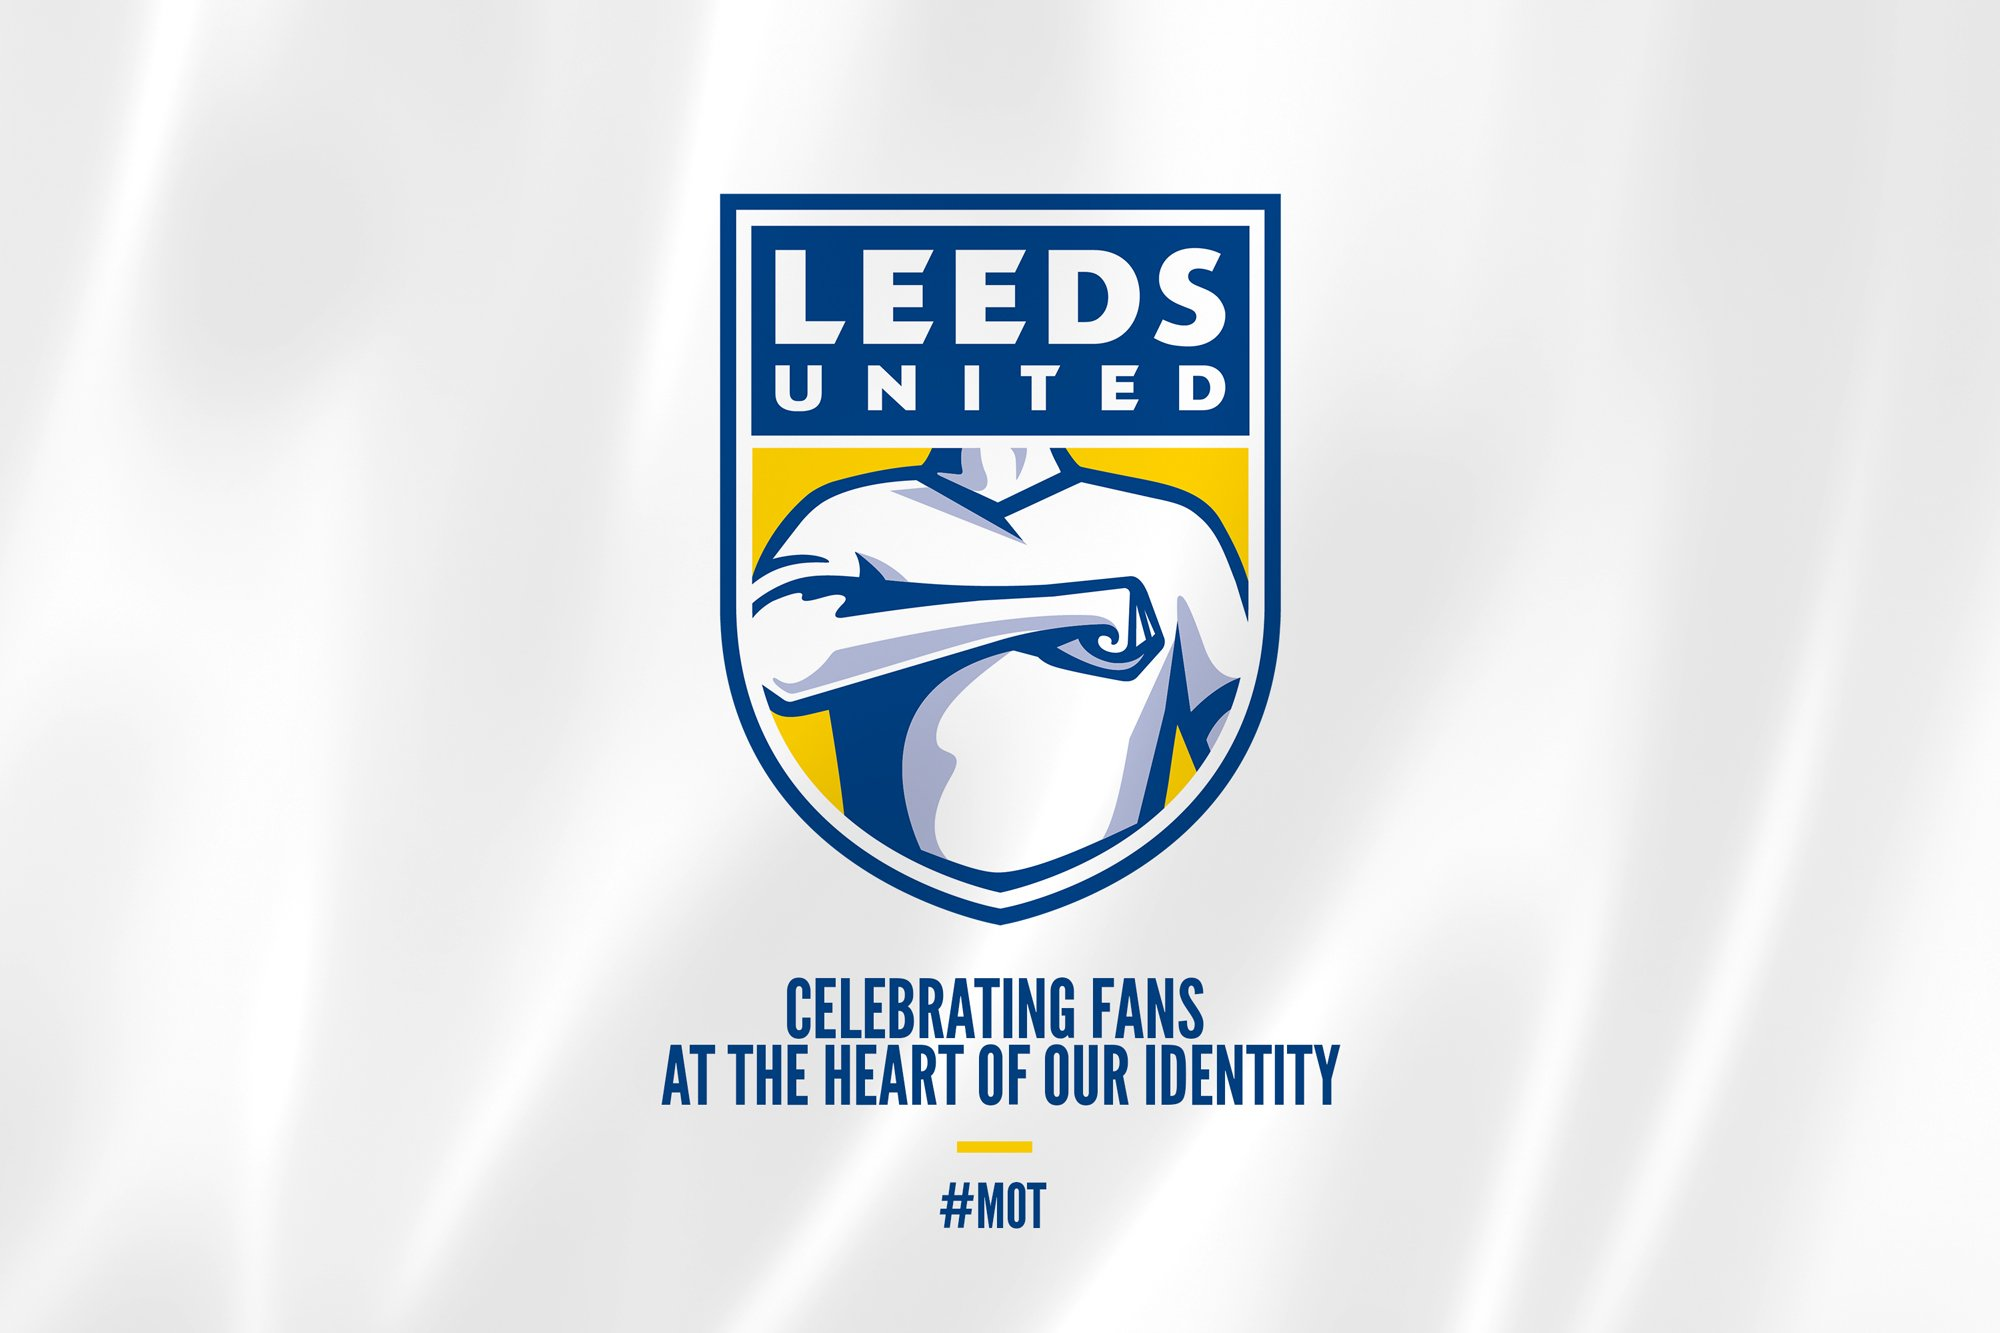 Leeds new logo